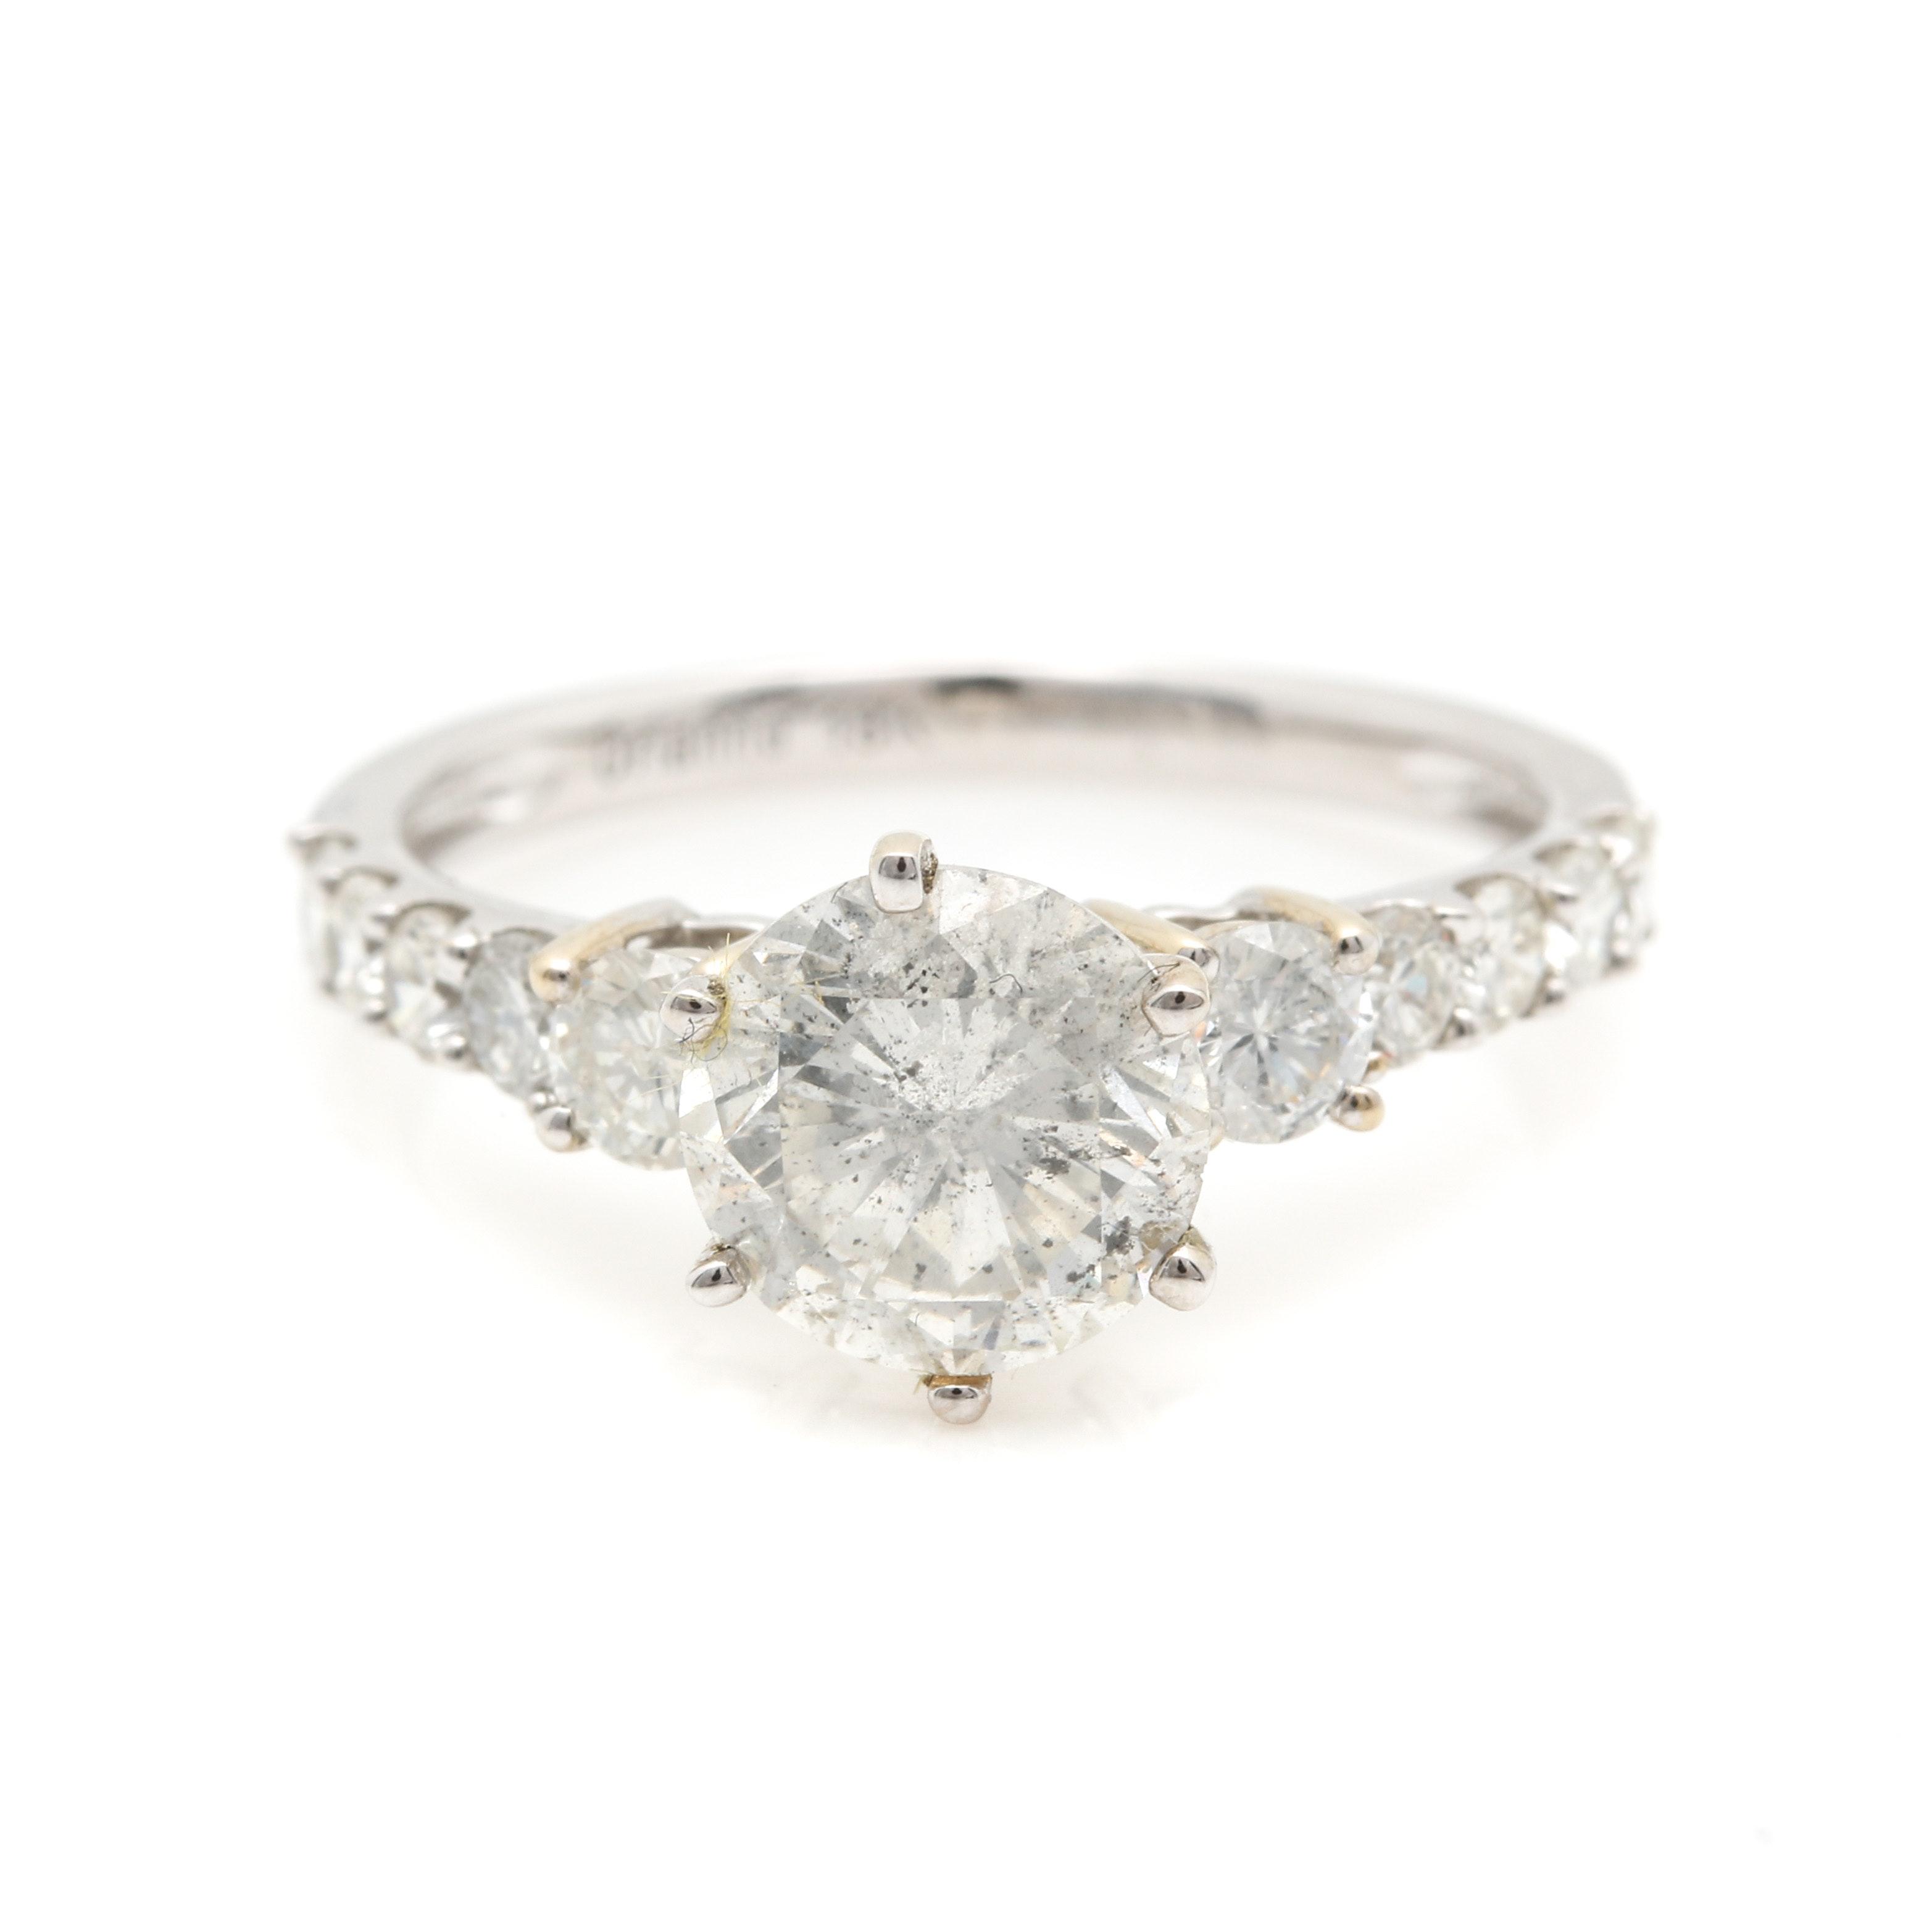 18K White Gold 2.40 CTW Diamond Ring